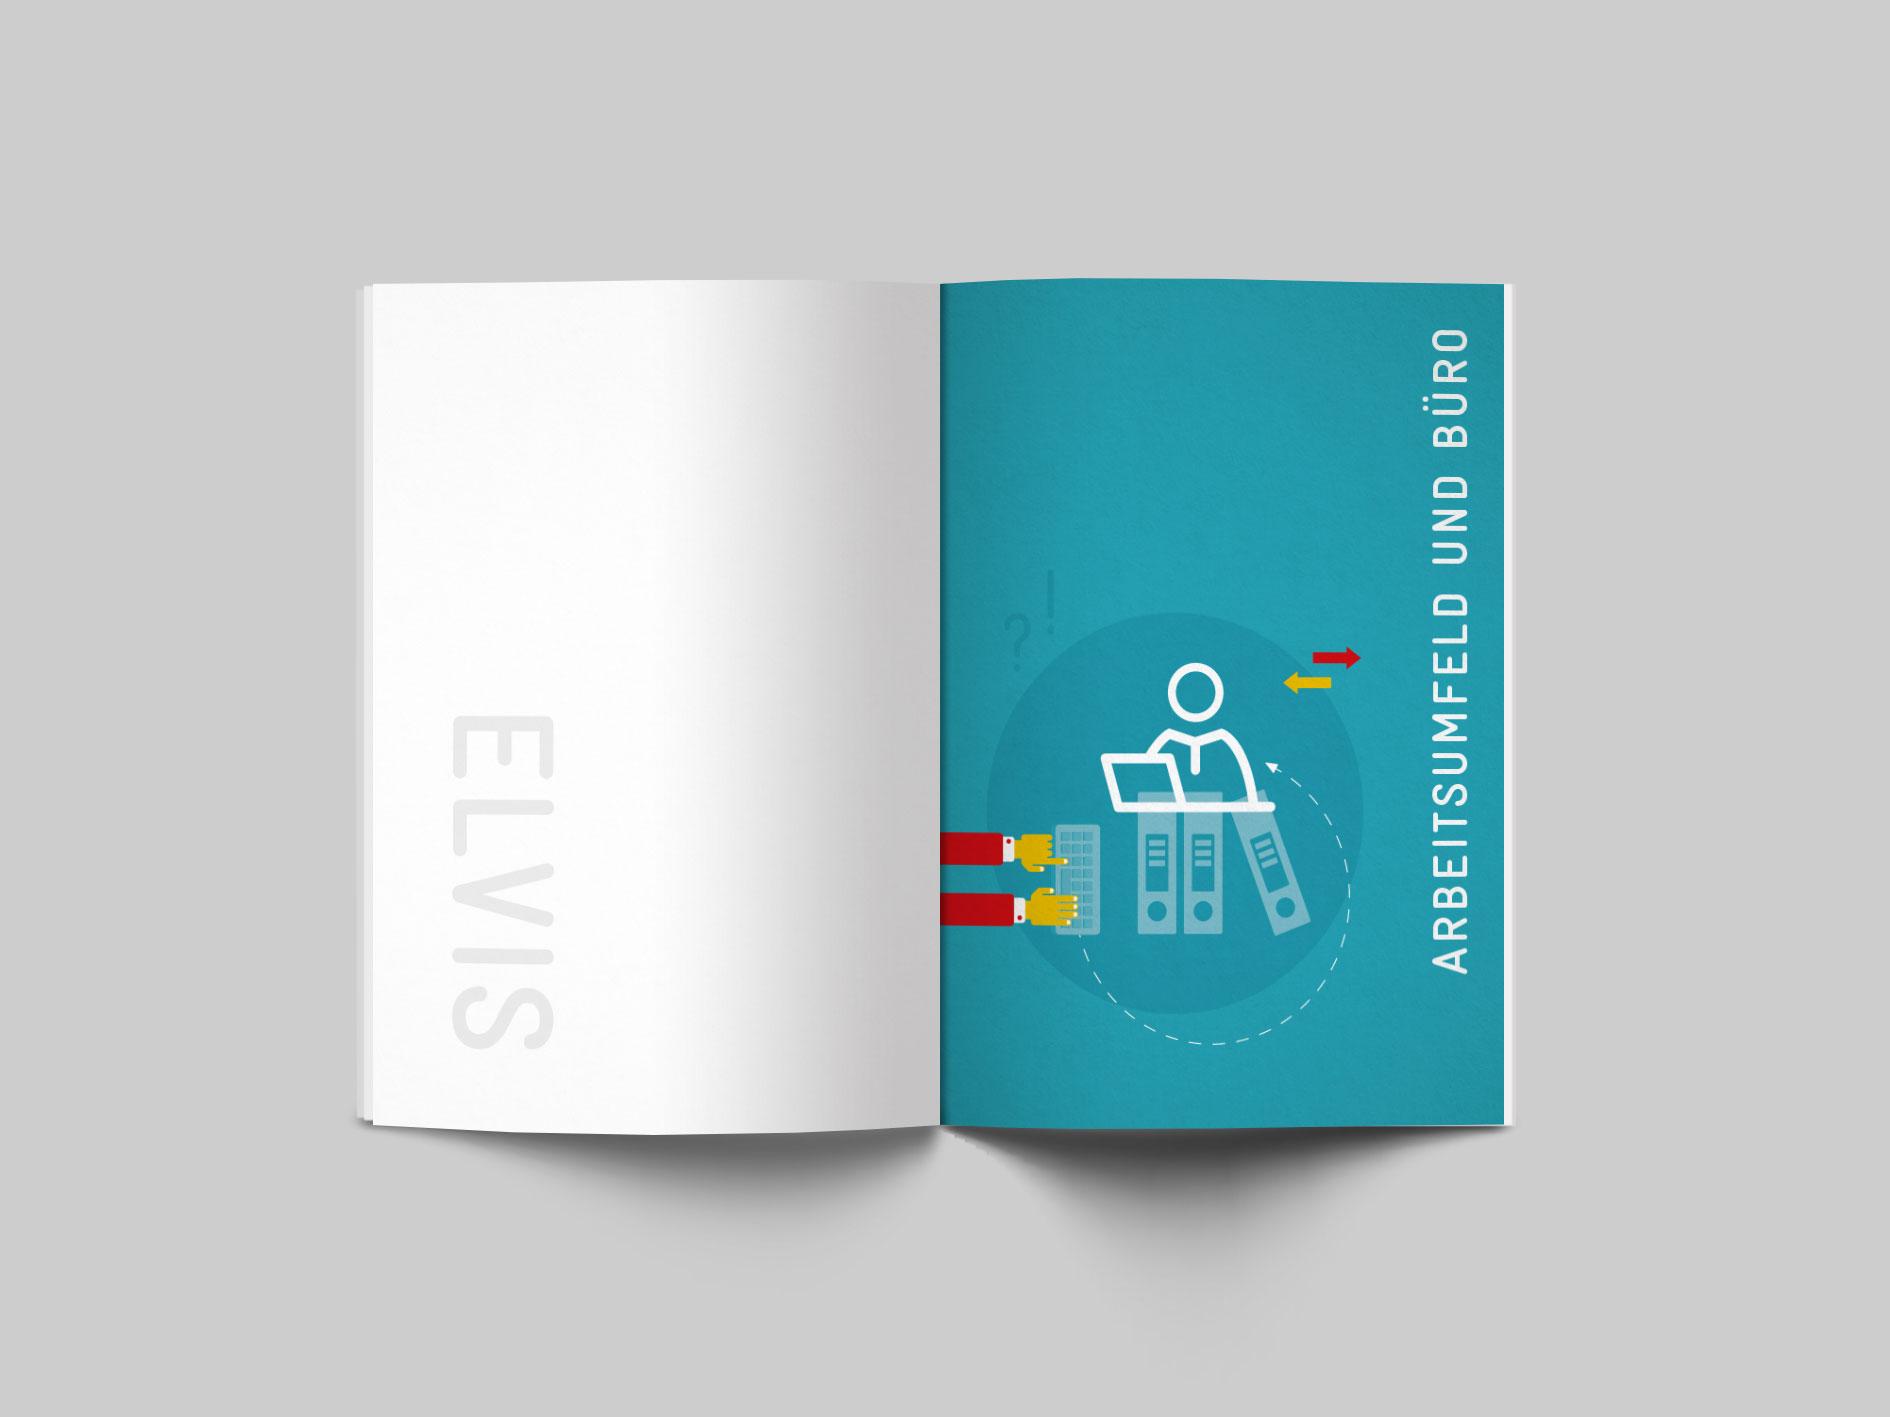 Portfolio_KROMATIV_Broschueren_GIZ_ELVIS_02_2